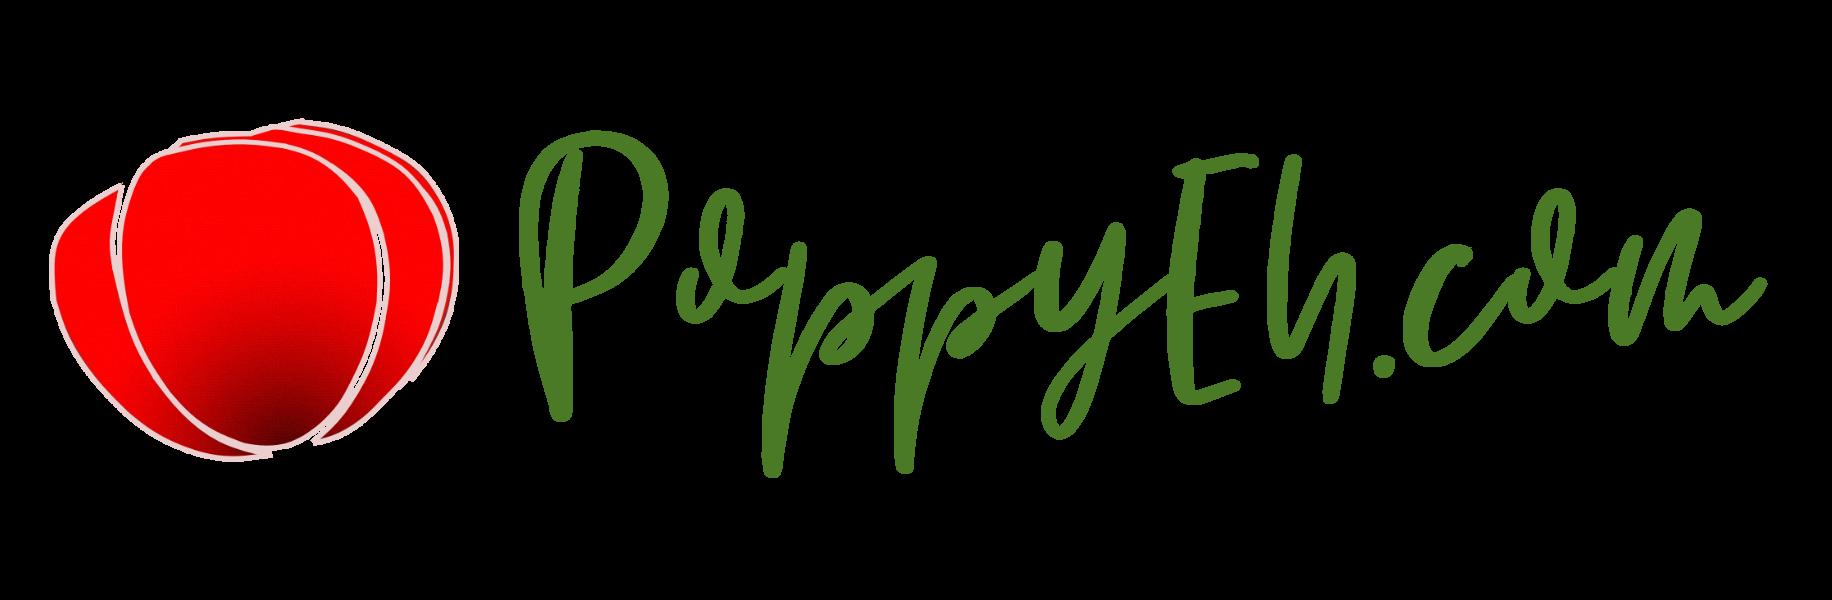 Poppyeh.com